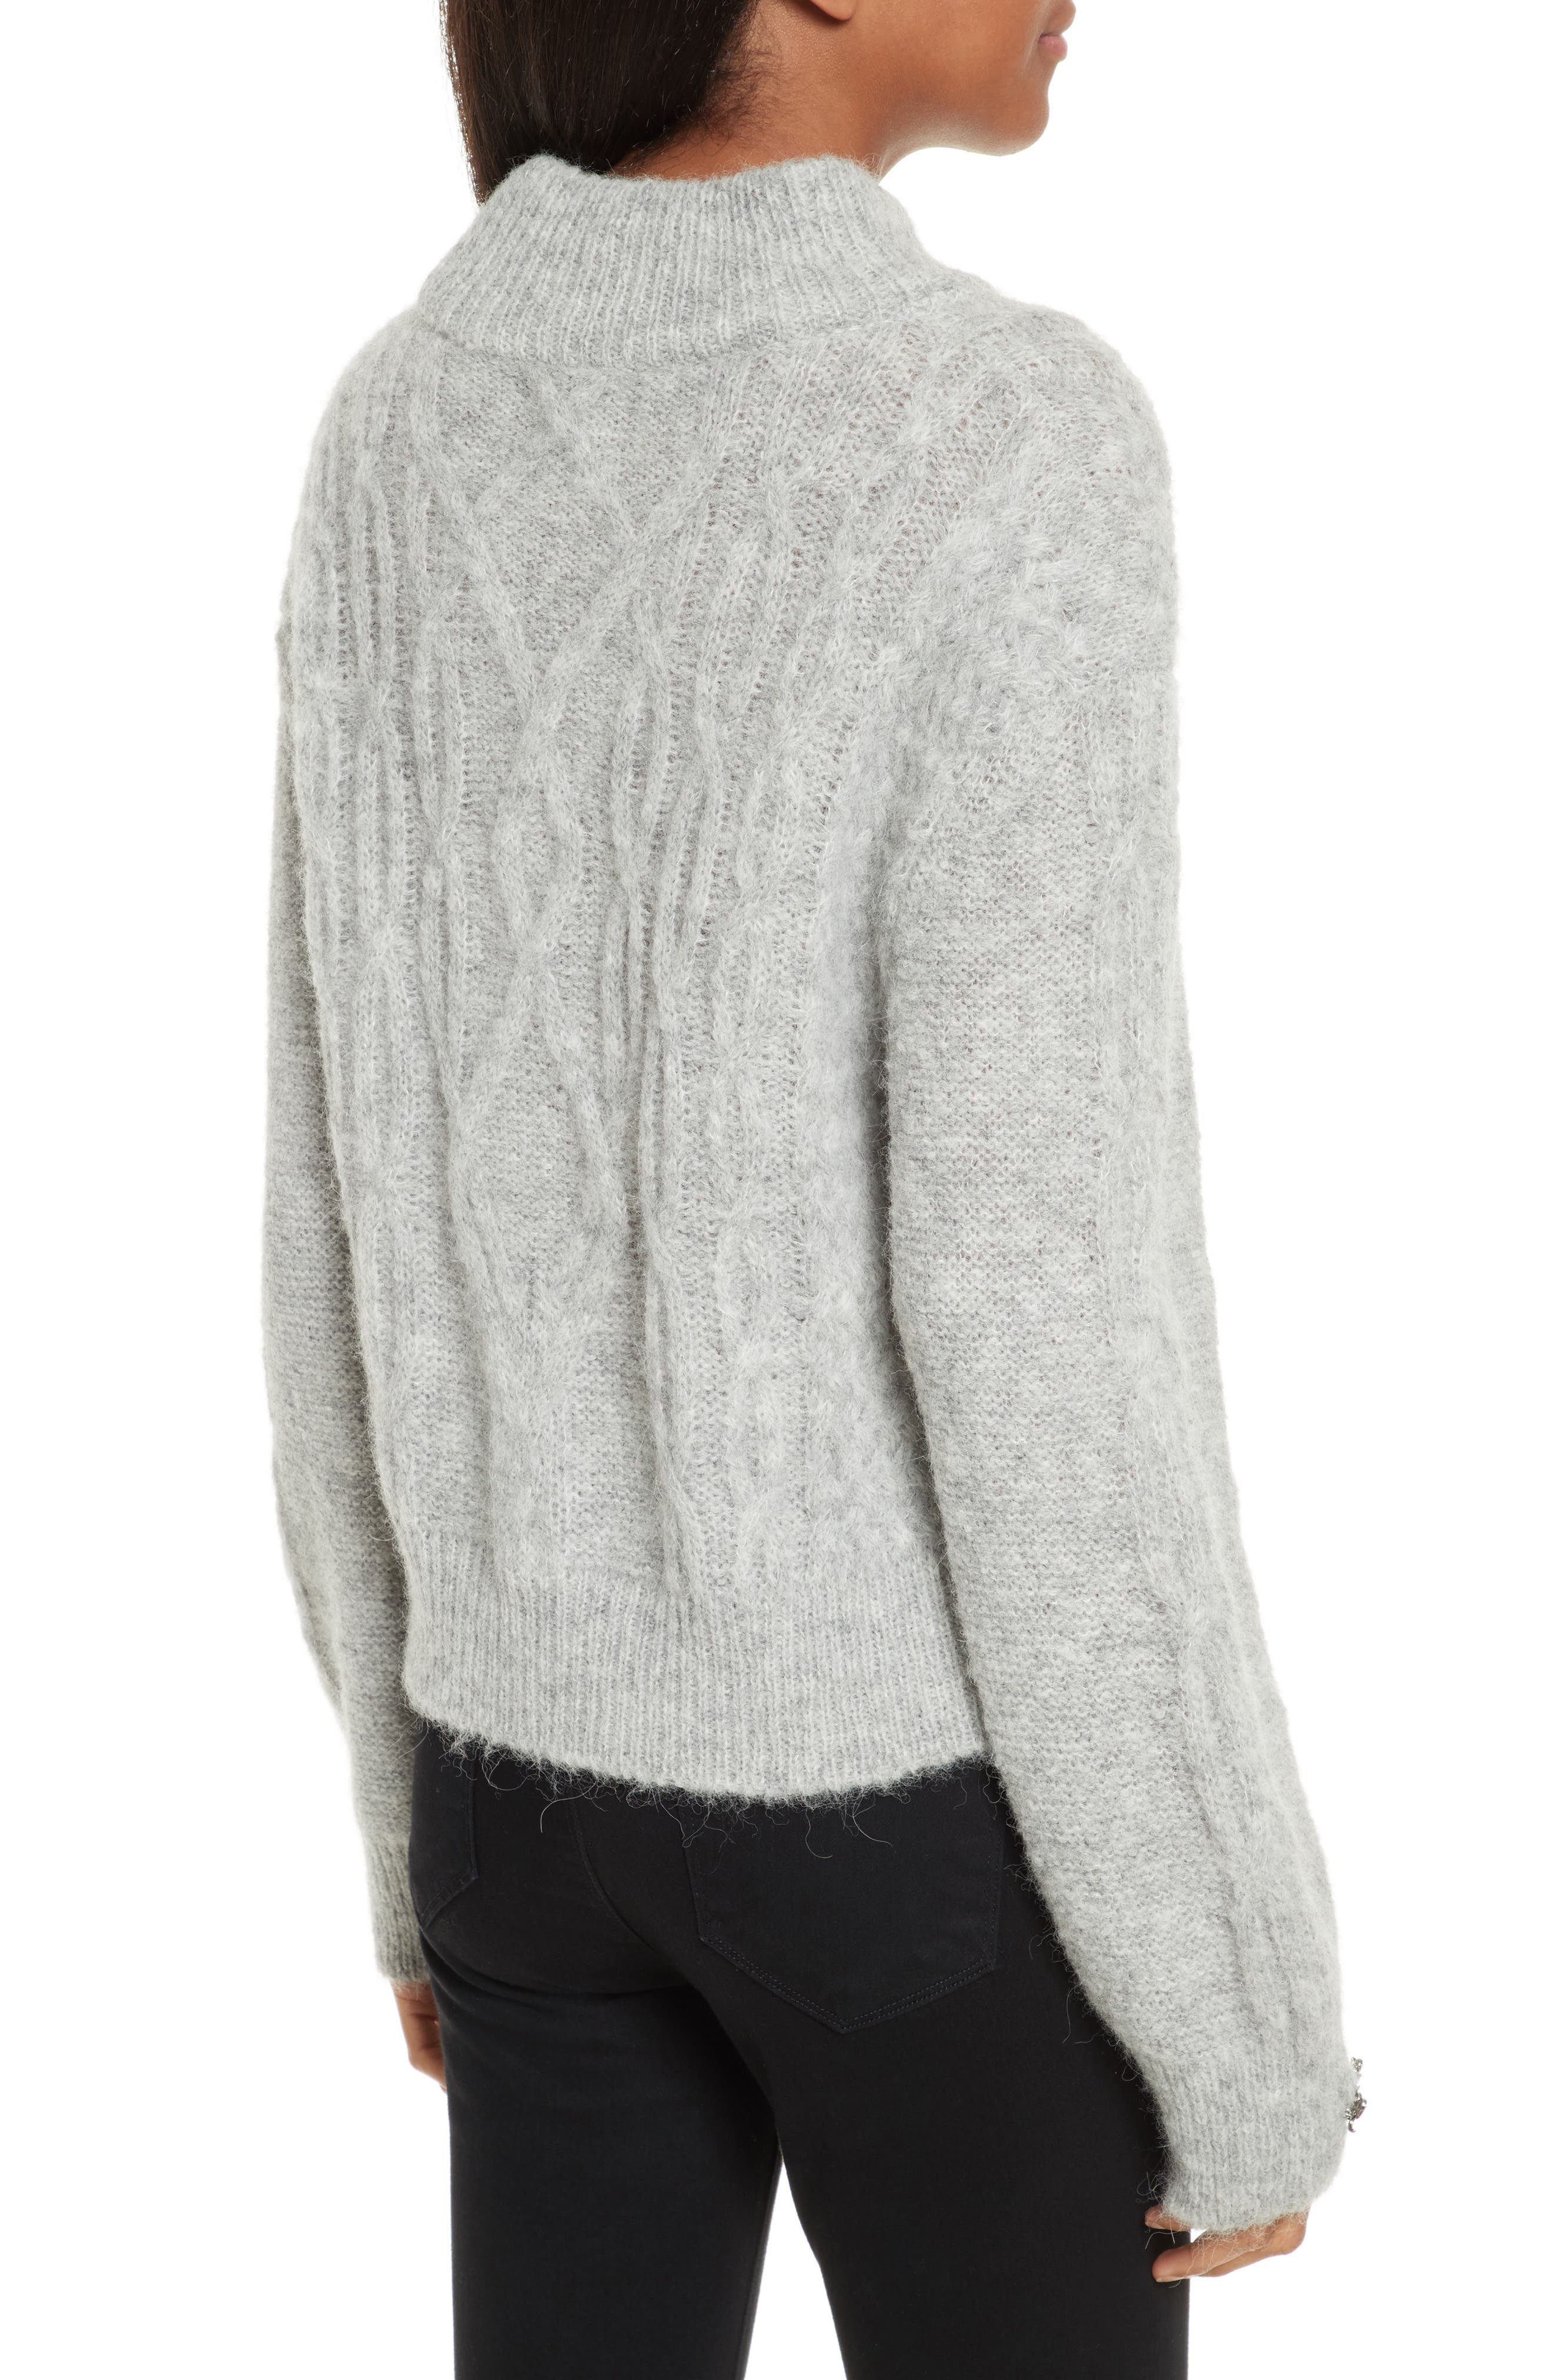 Garlan Mock Neck Sweater,                             Alternate thumbnail 2, color,                             Light Heather Grey